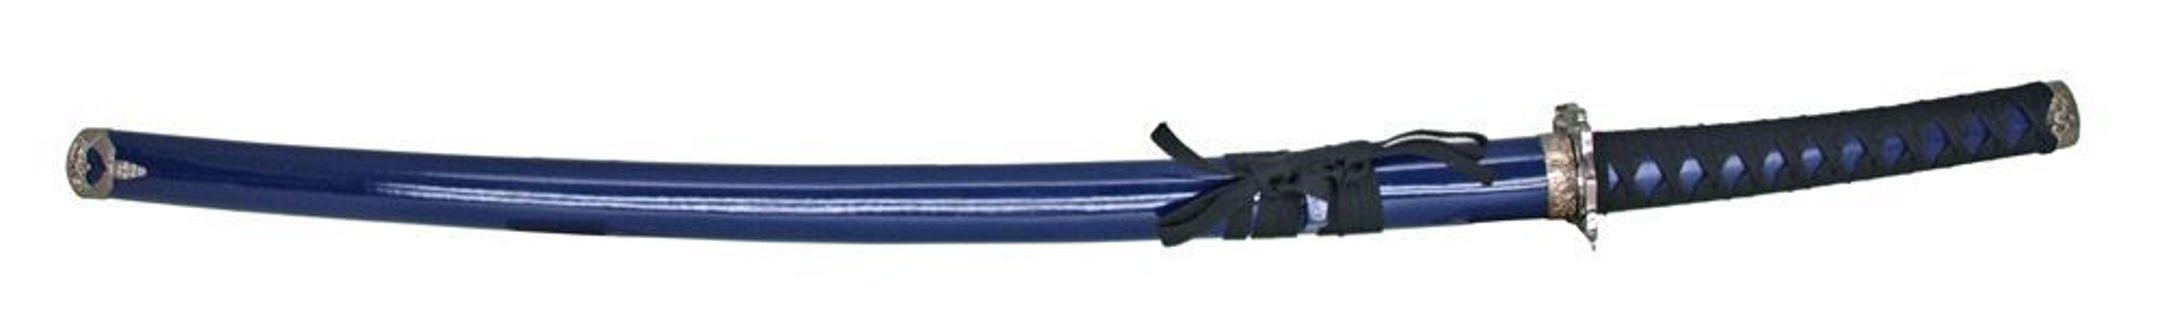 "40"" Dragon Samurai Sword - Blue *NEW* (SW010-BL)"